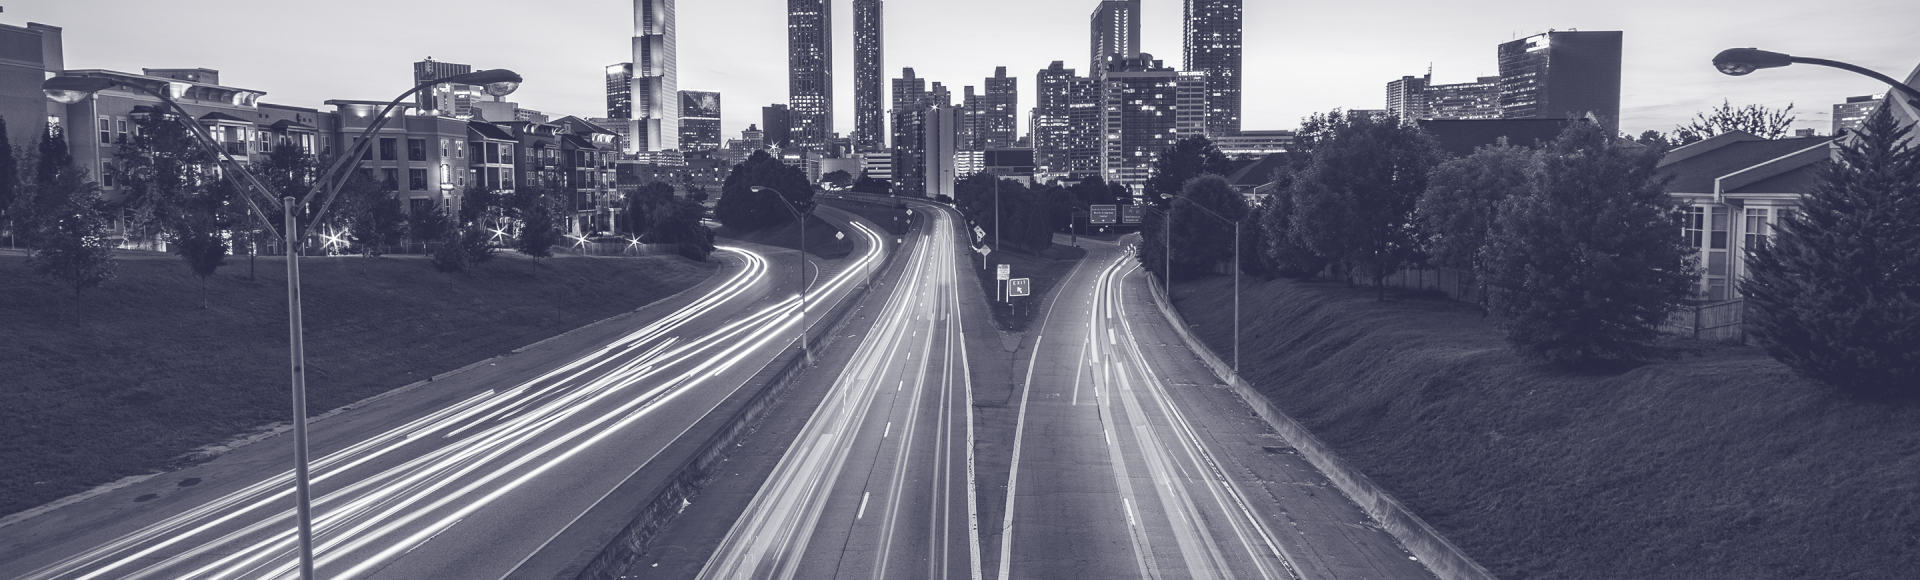 ARK-Invest_Blog-Banner_2017_09_20---Autonomous-Taxis-Late